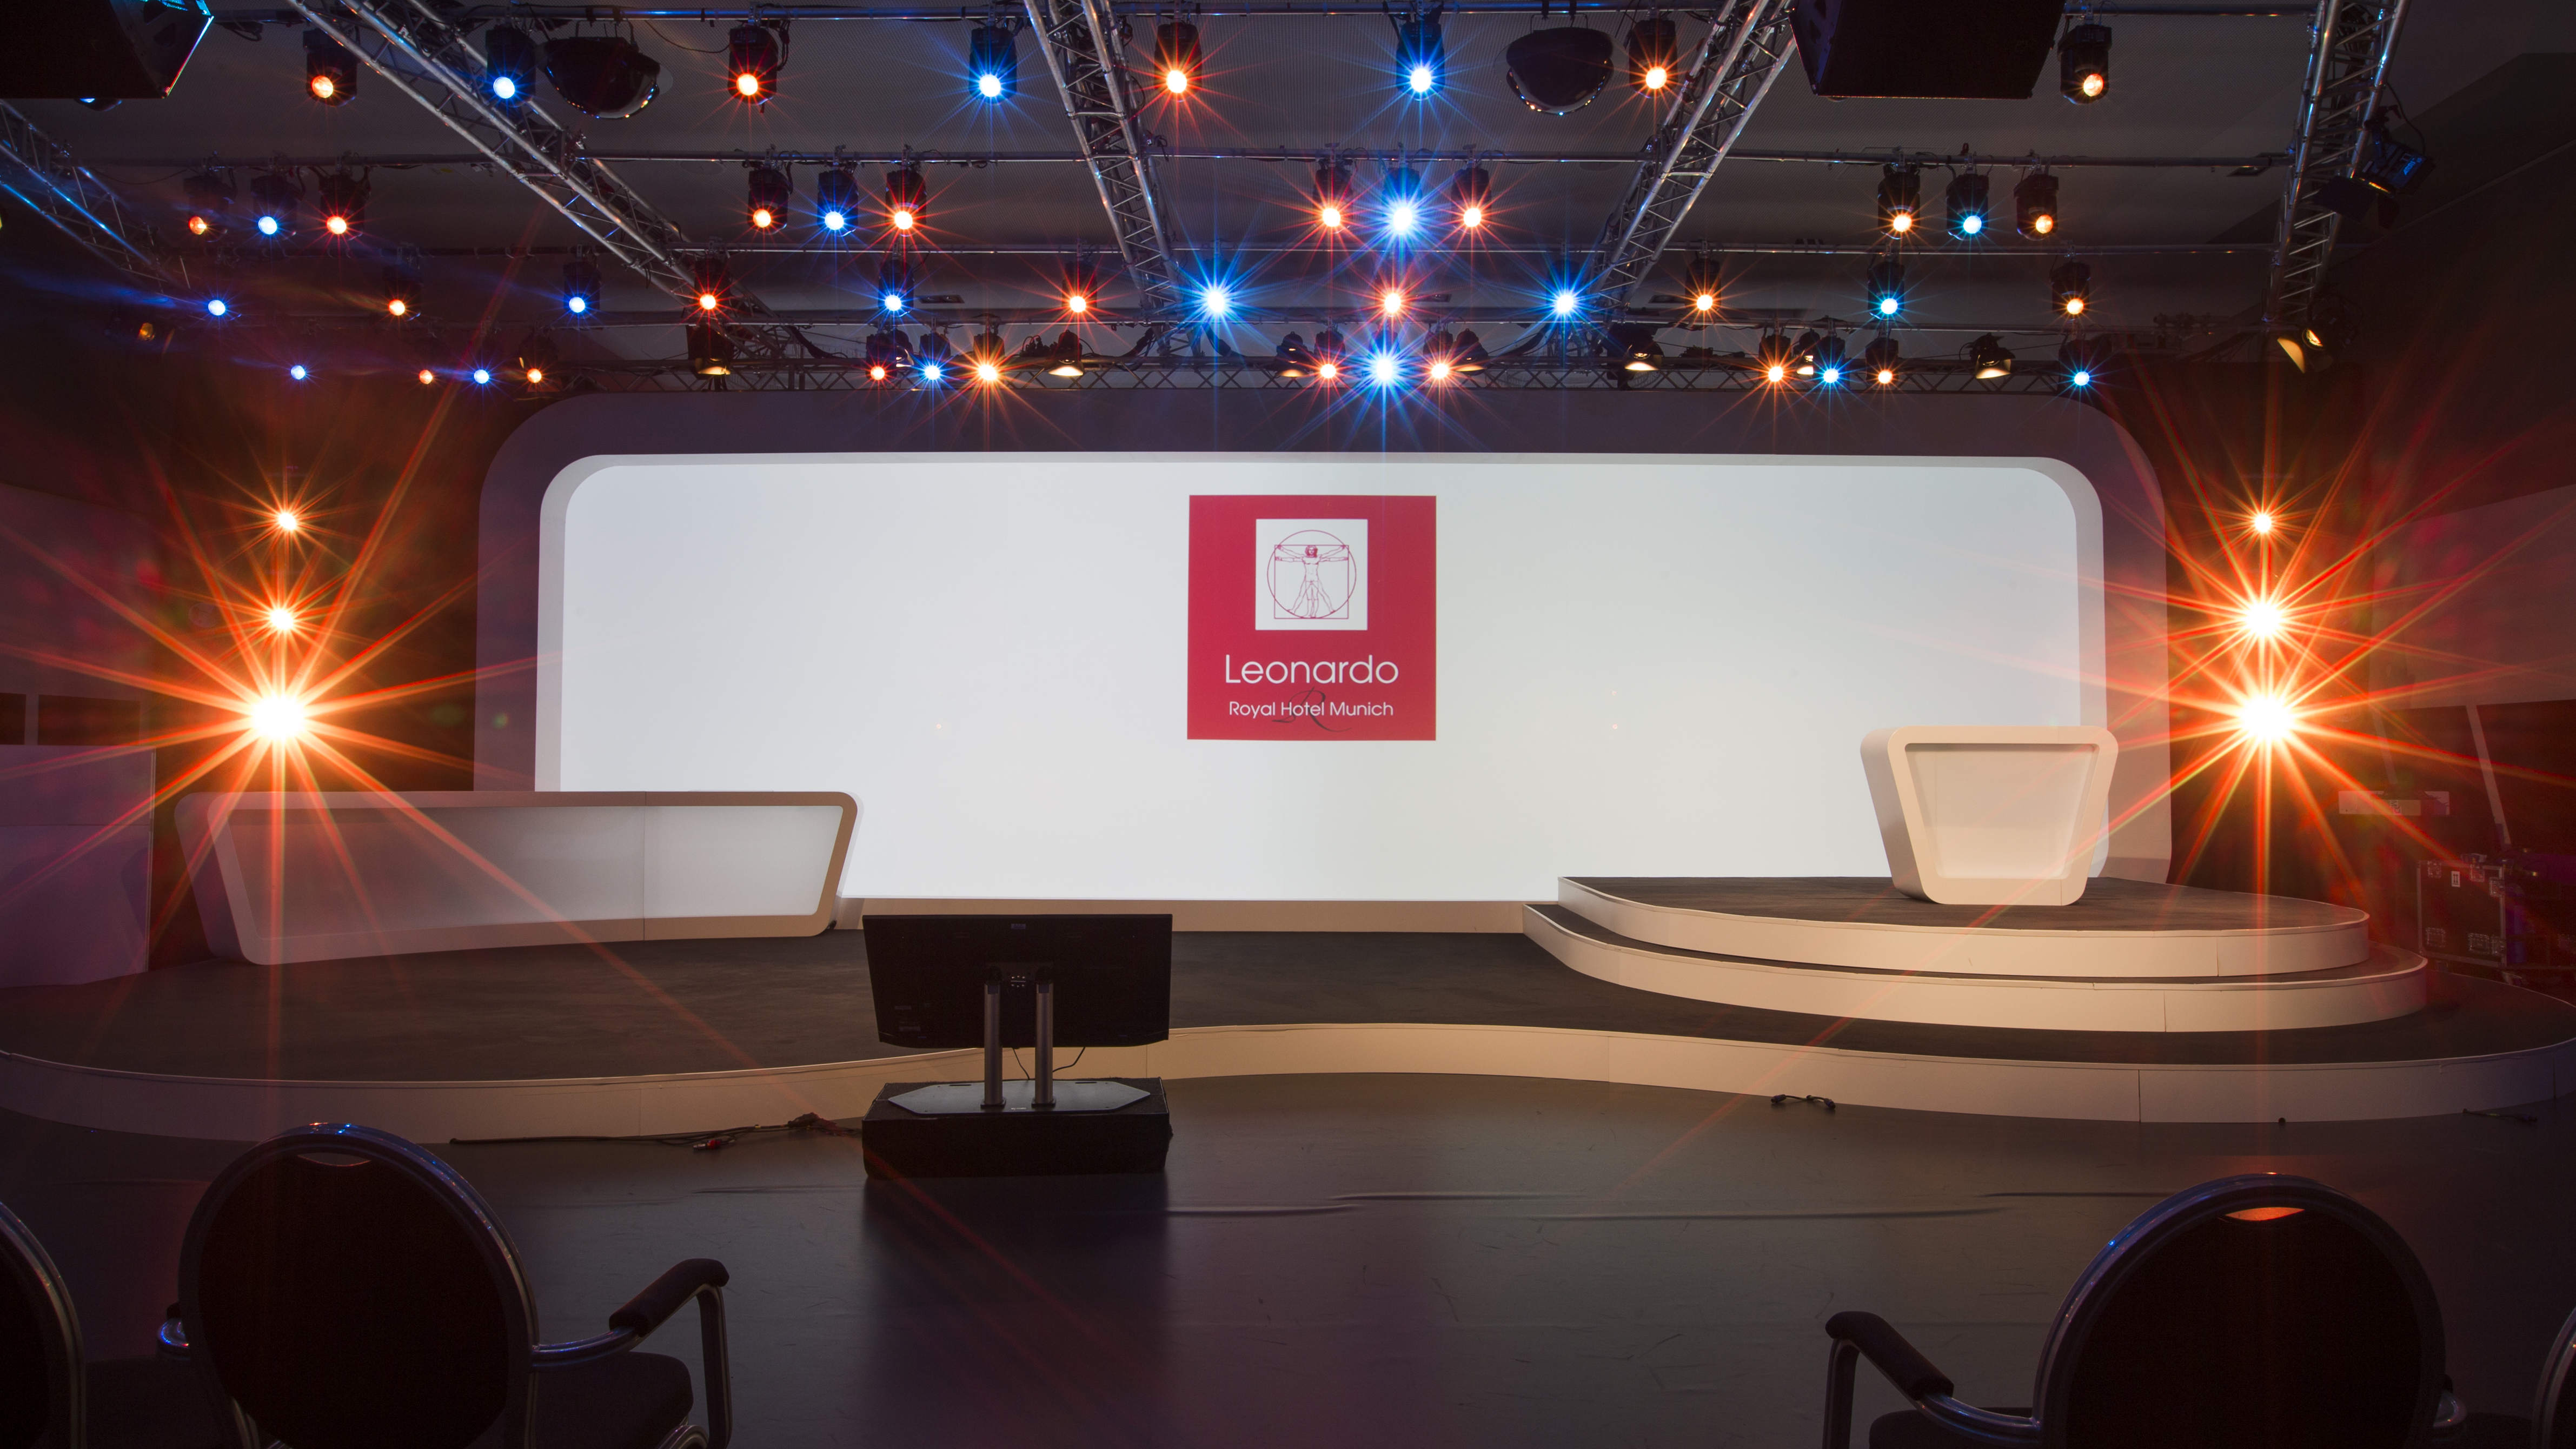 Leonardo Hotels Central Europe Digitale Meetings Hybrid Virtuell Persönlich